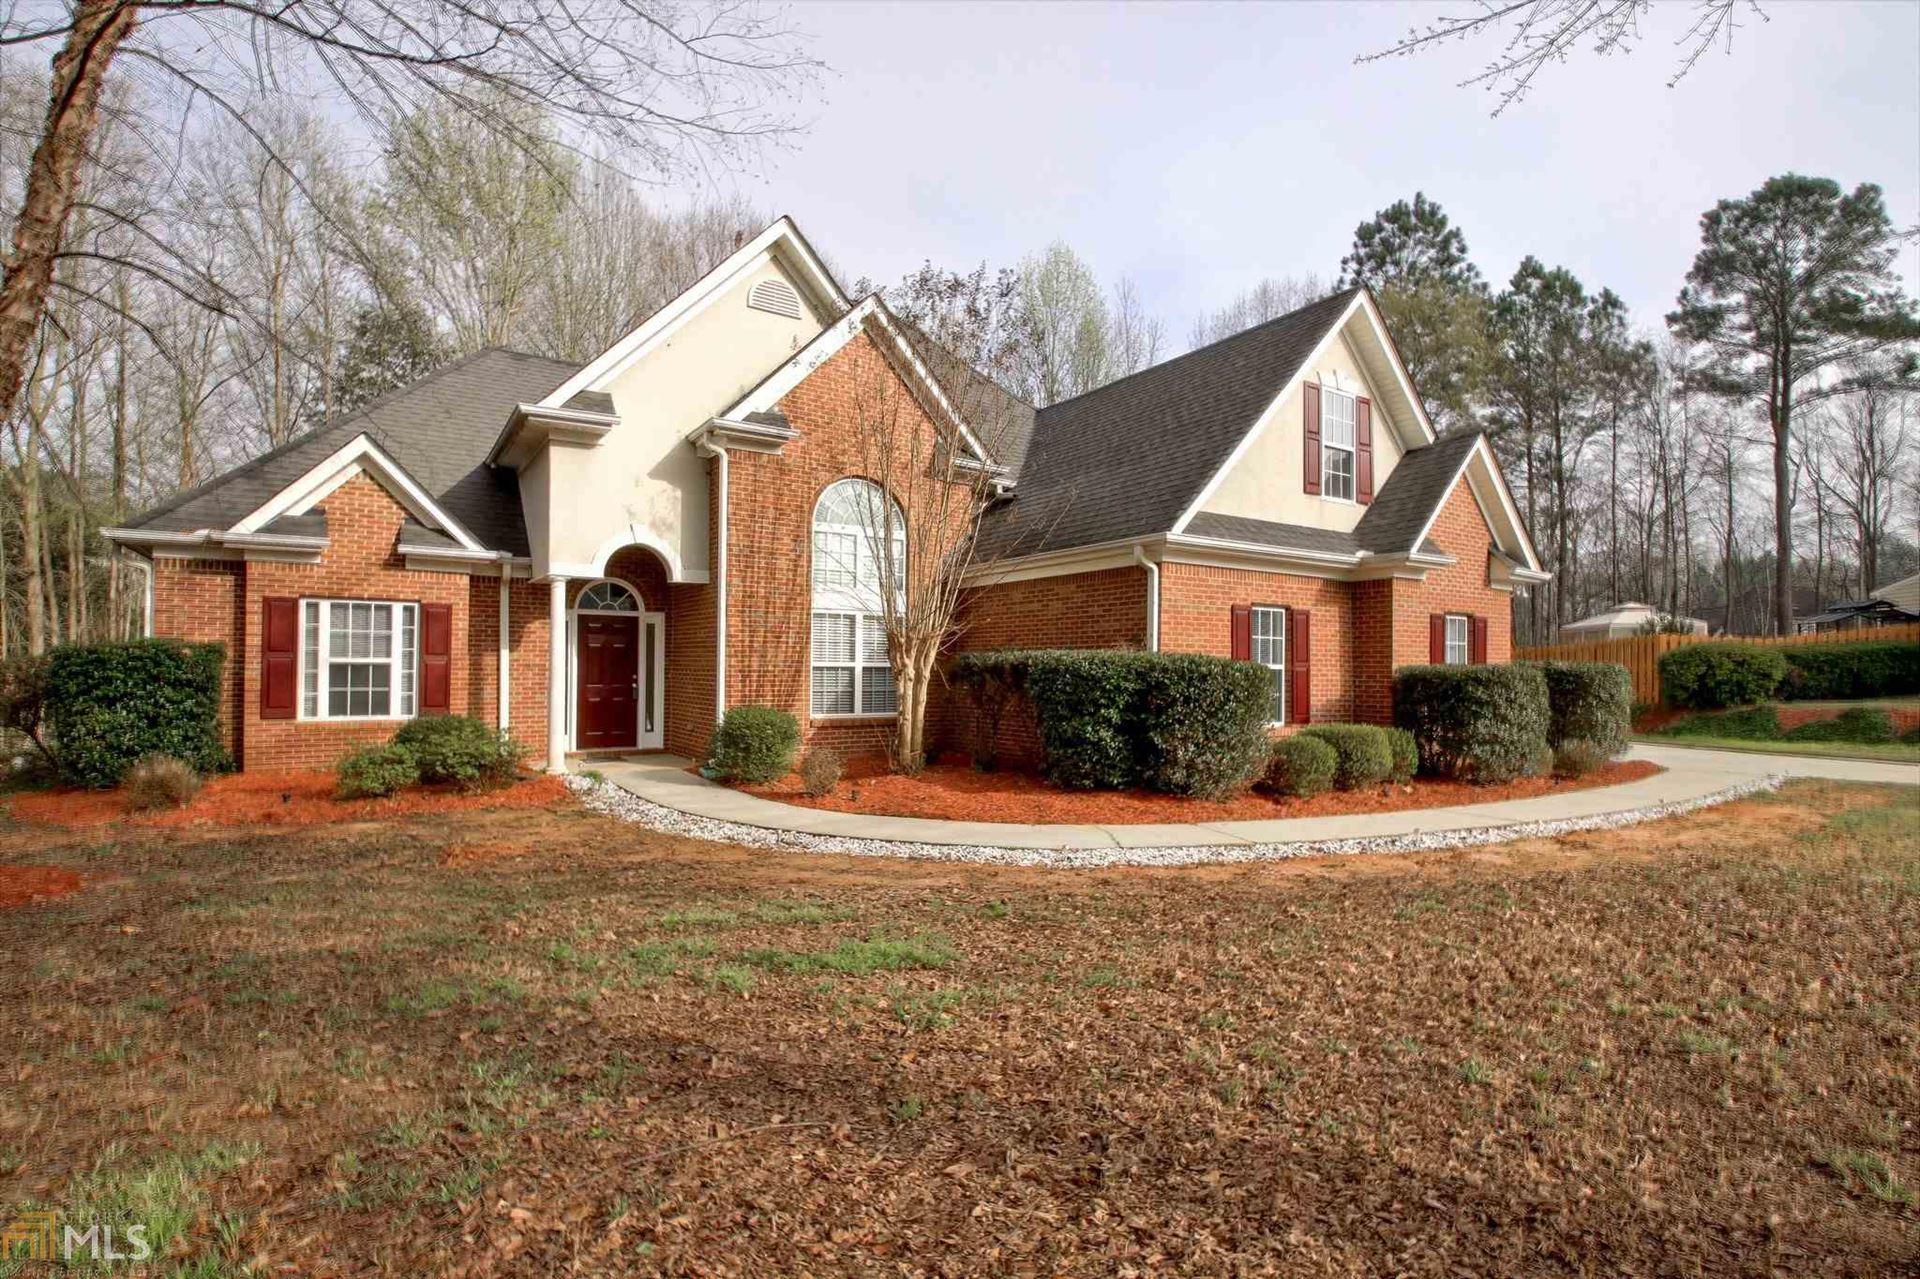 140 Brookridge Ct, Fayetteville, GA 30215 - #: 8760229